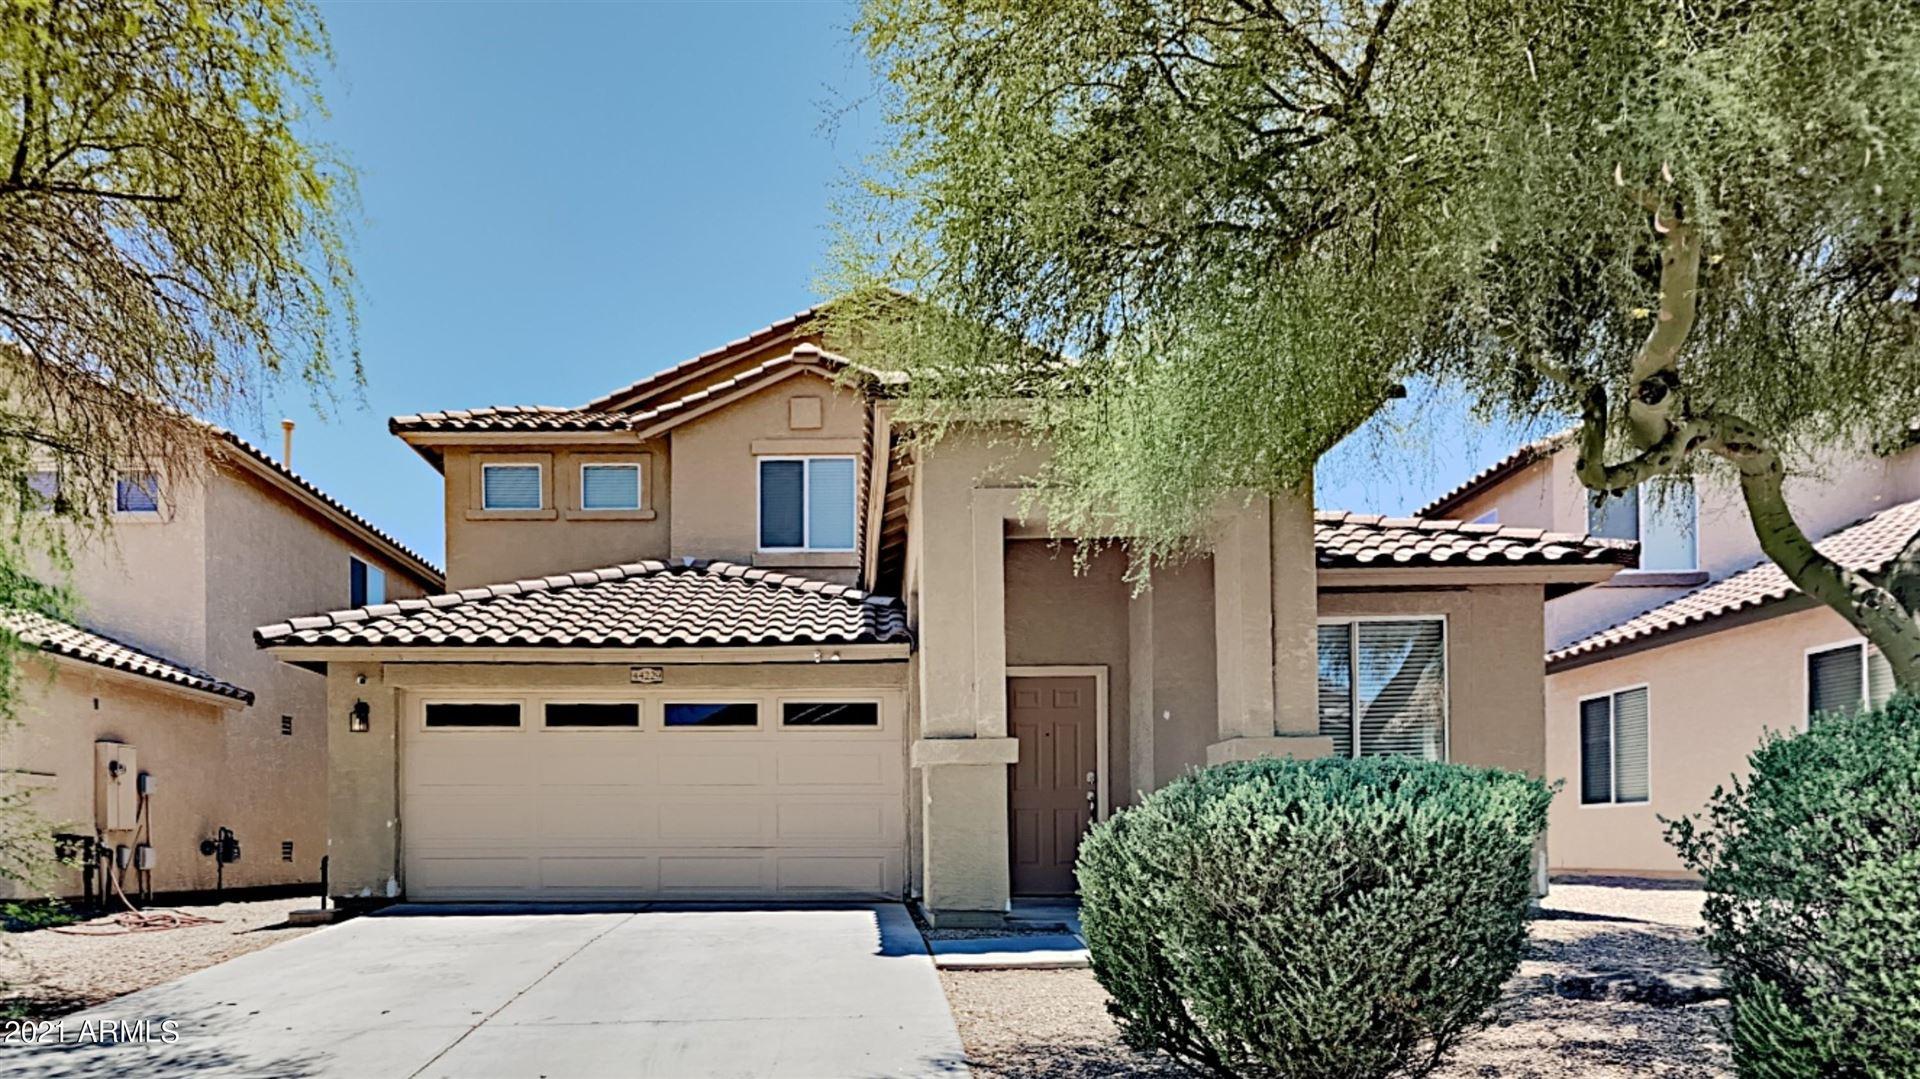 Photo for 44229 W OSTER Drive, Maricopa, AZ 85138 (MLS # 6262526)